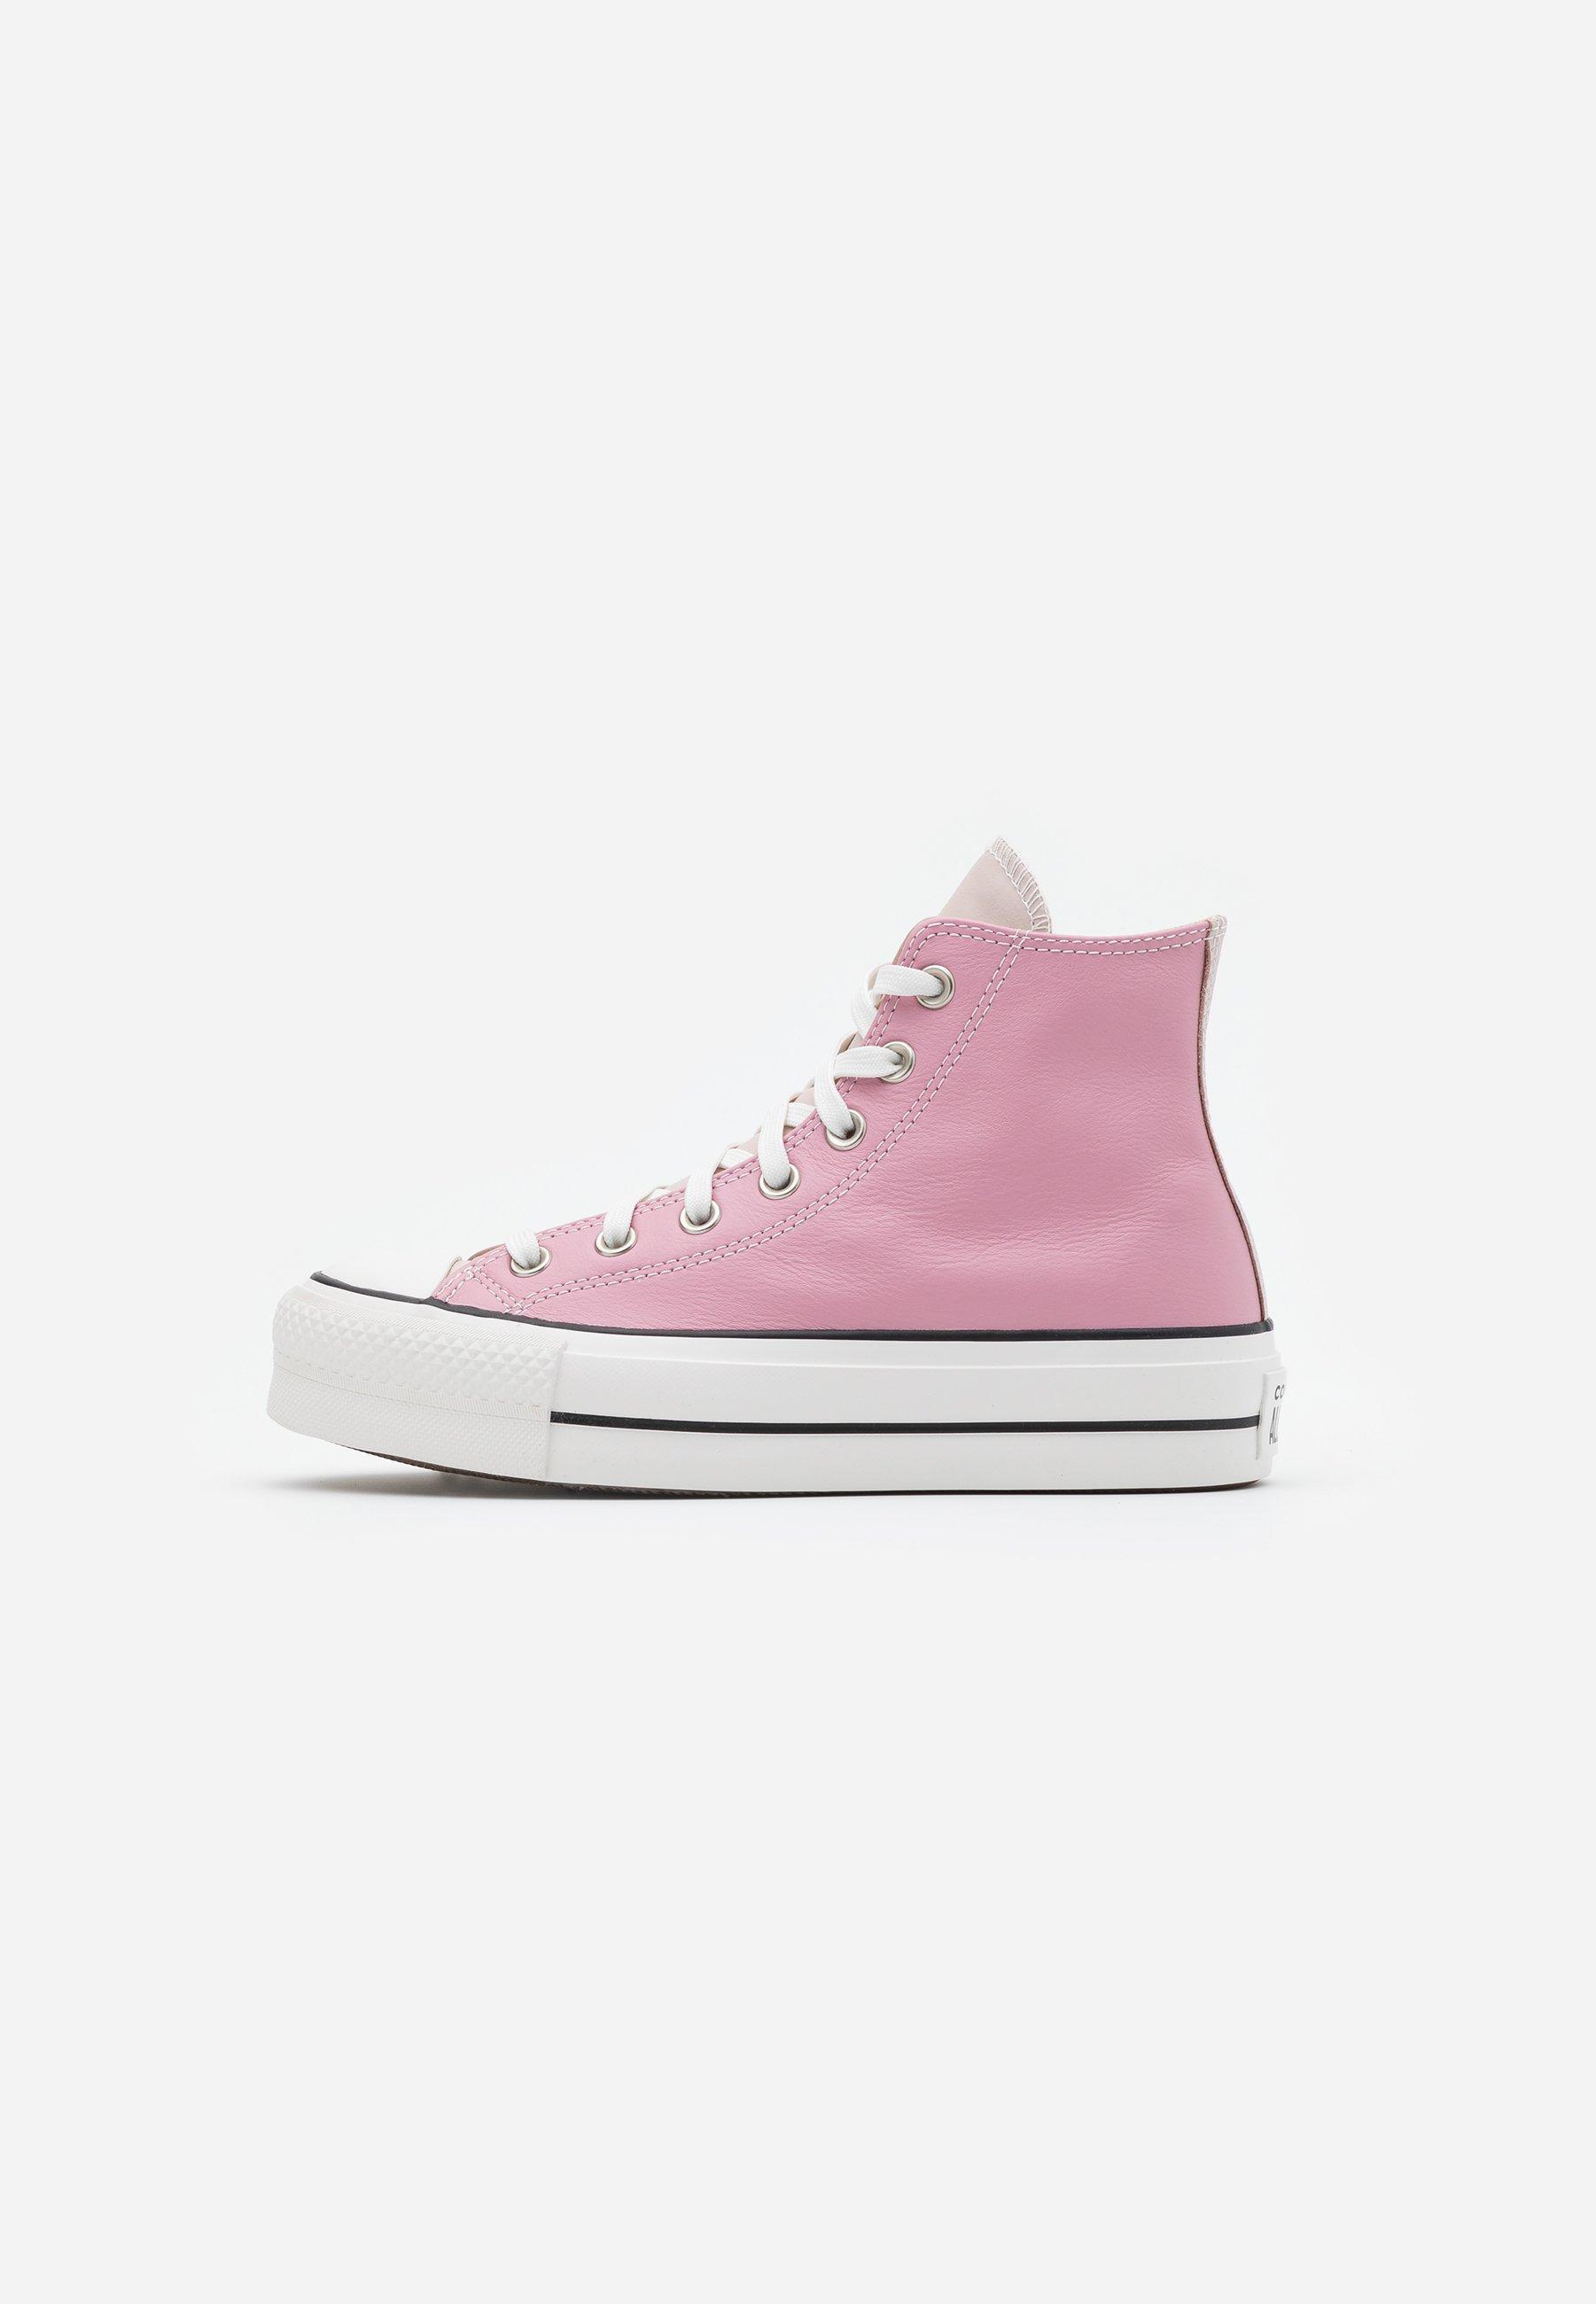 converse platform rosa alte